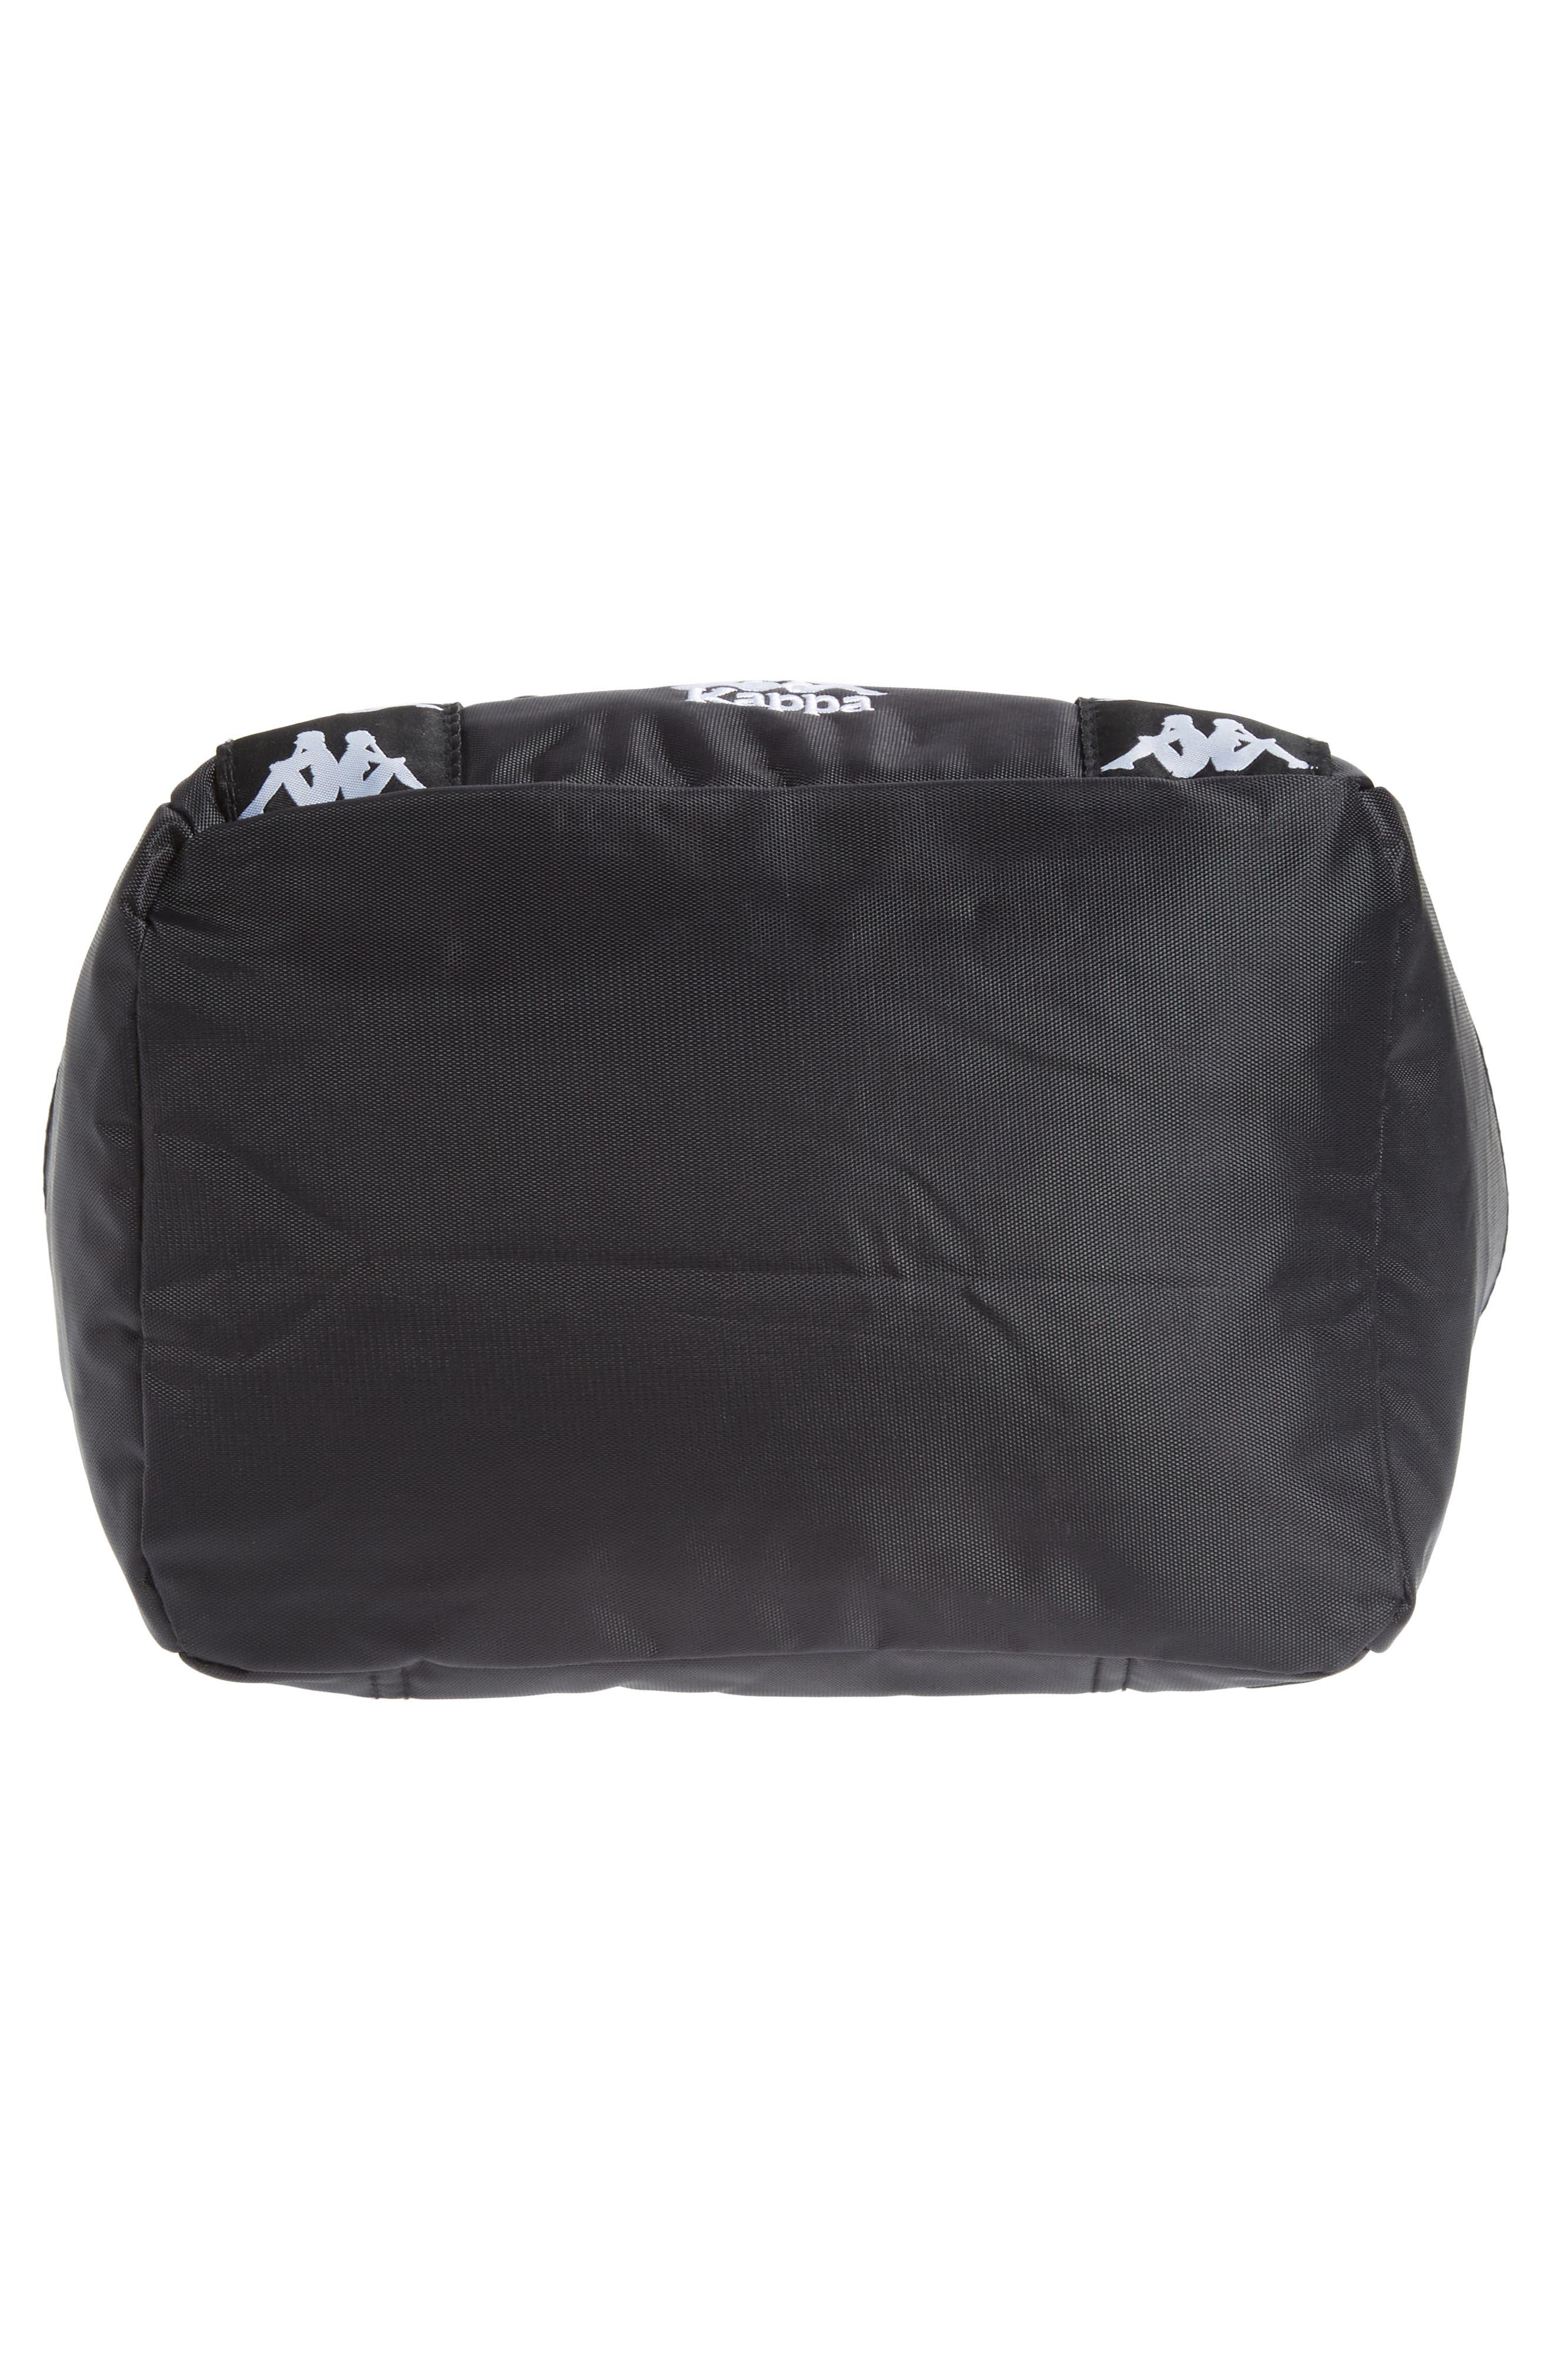 Medium Athletic Backpack,                             Alternate thumbnail 6, color,                             BLACK-WHITE